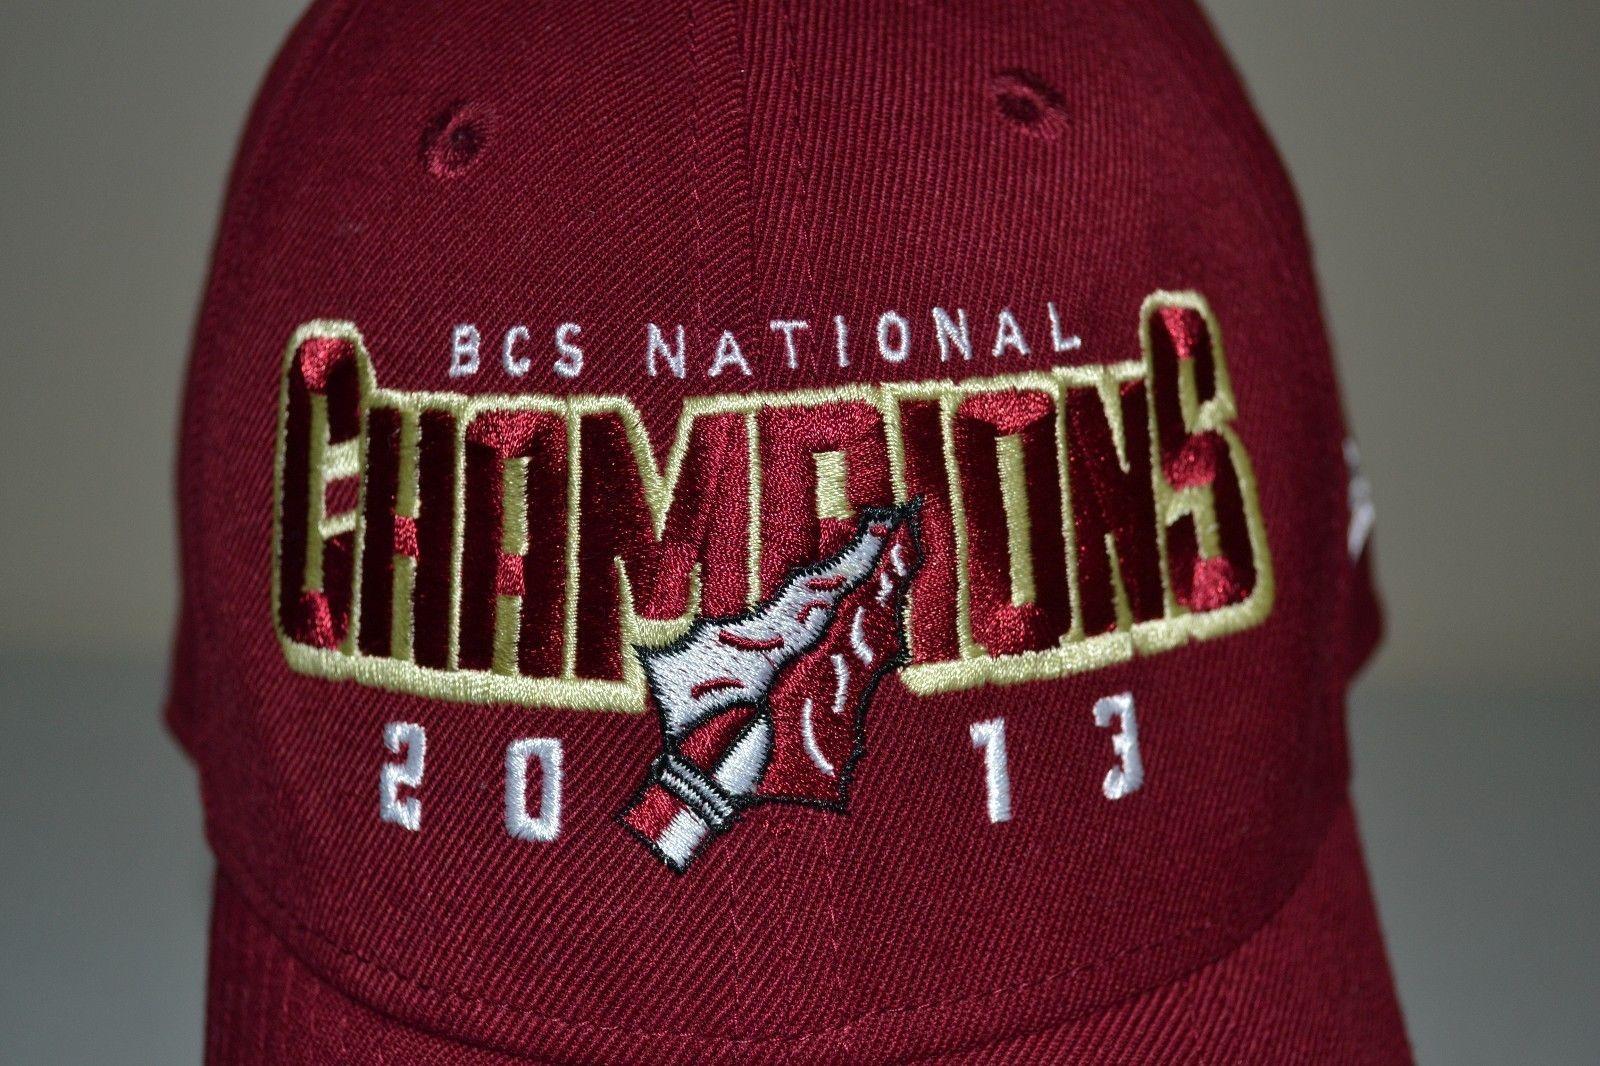 ec1760a6 FLORIDA STATE SEMINOLES BCS NTL CHAMPIONS 2013 FITTED HAT CAP L/XL USED